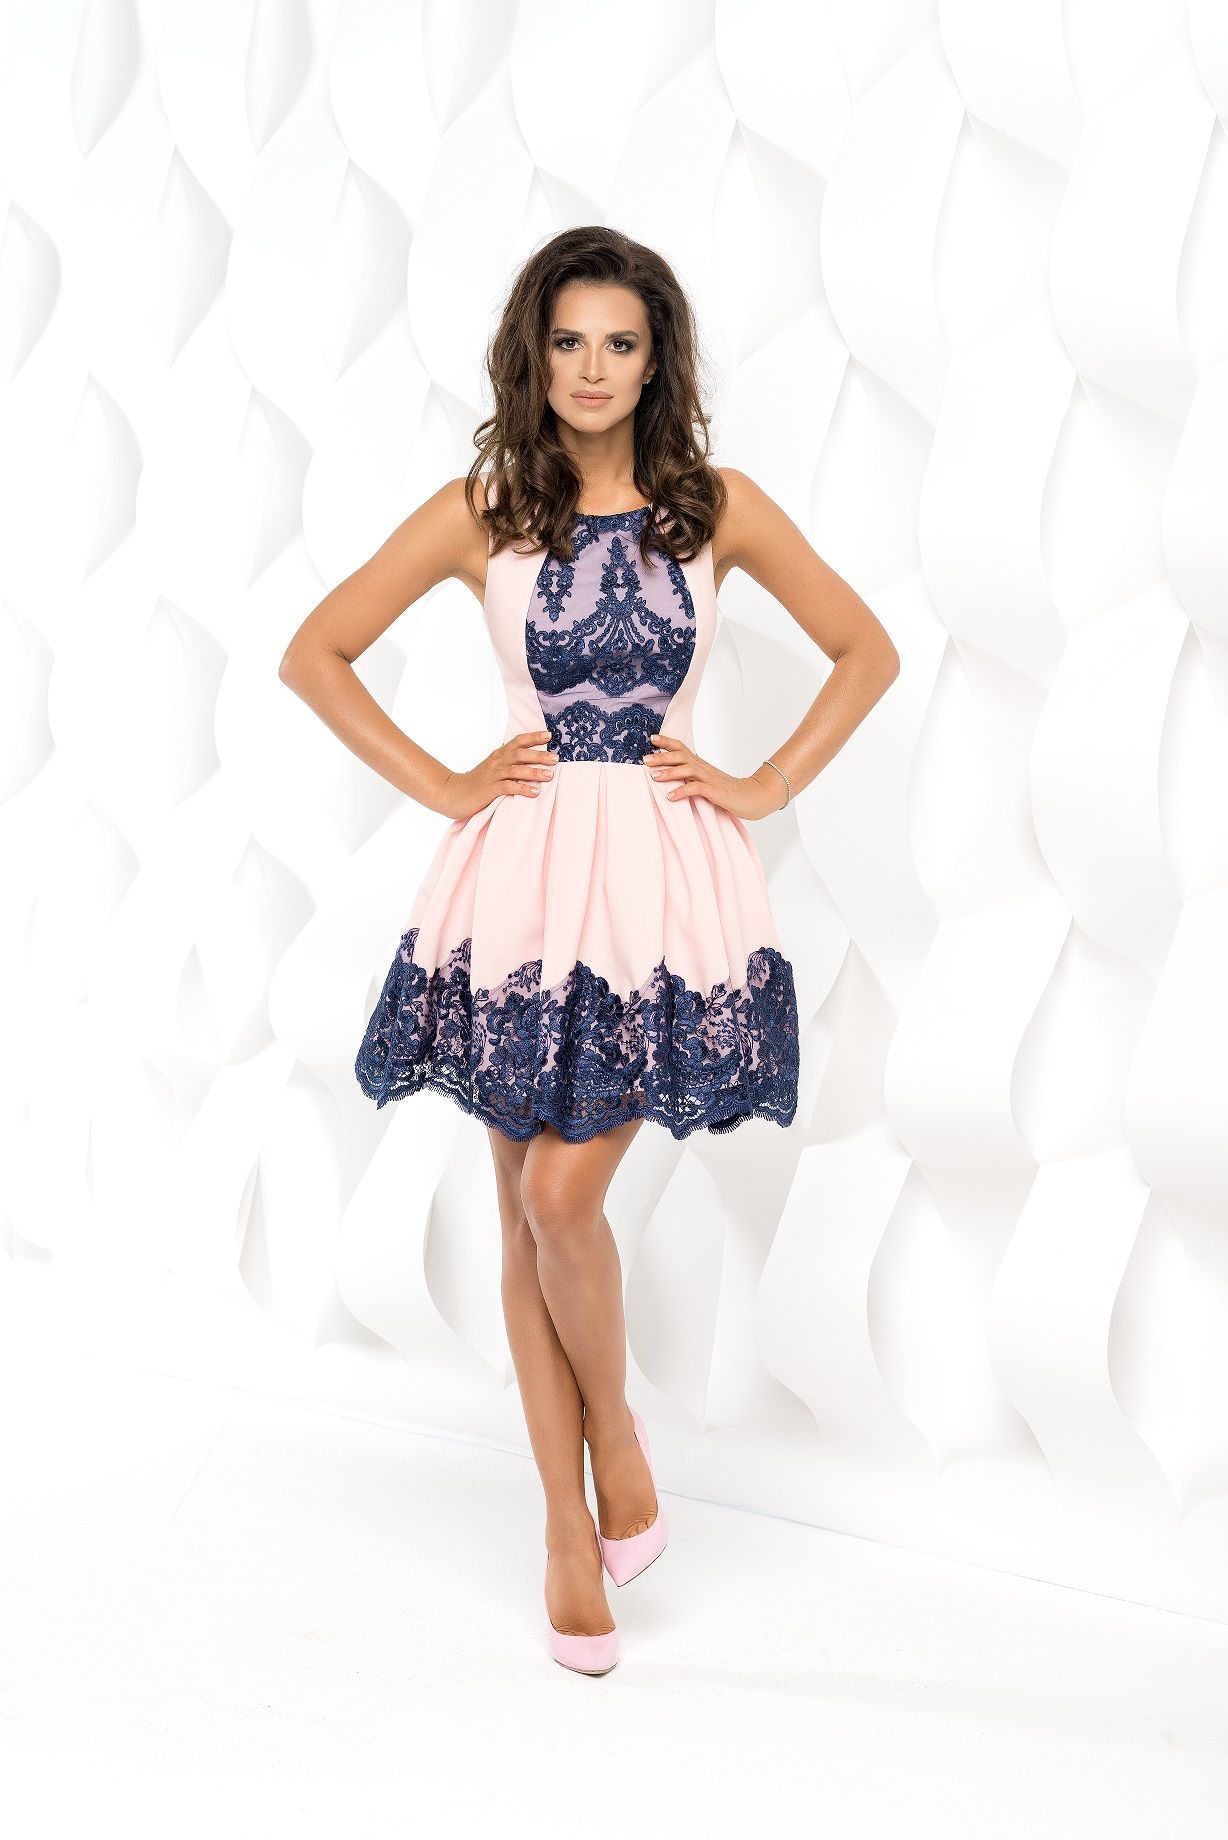 7a0b3064d95fb5 Bico sukienka mini koronkowa rozkloszowana | Sukienki | Sukienki ...